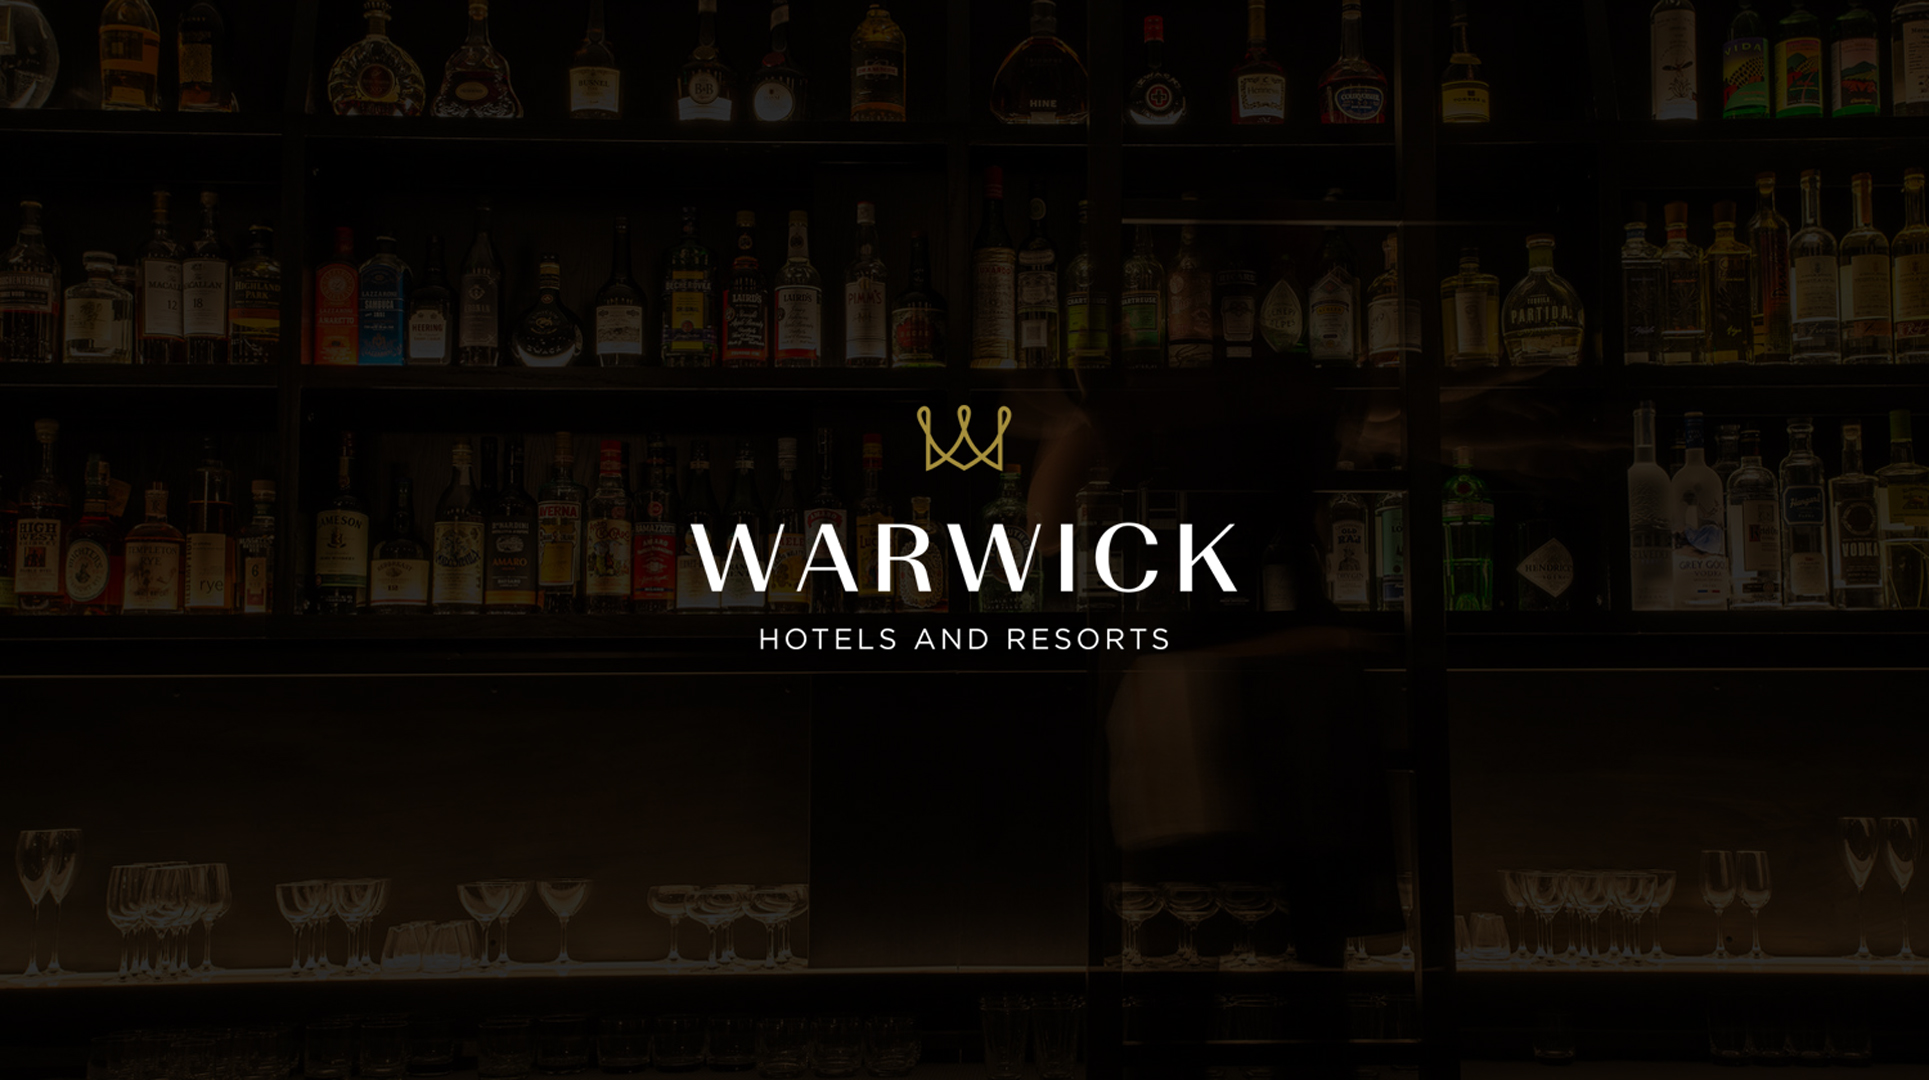 warwick hotels resorts blackletter branding design agency